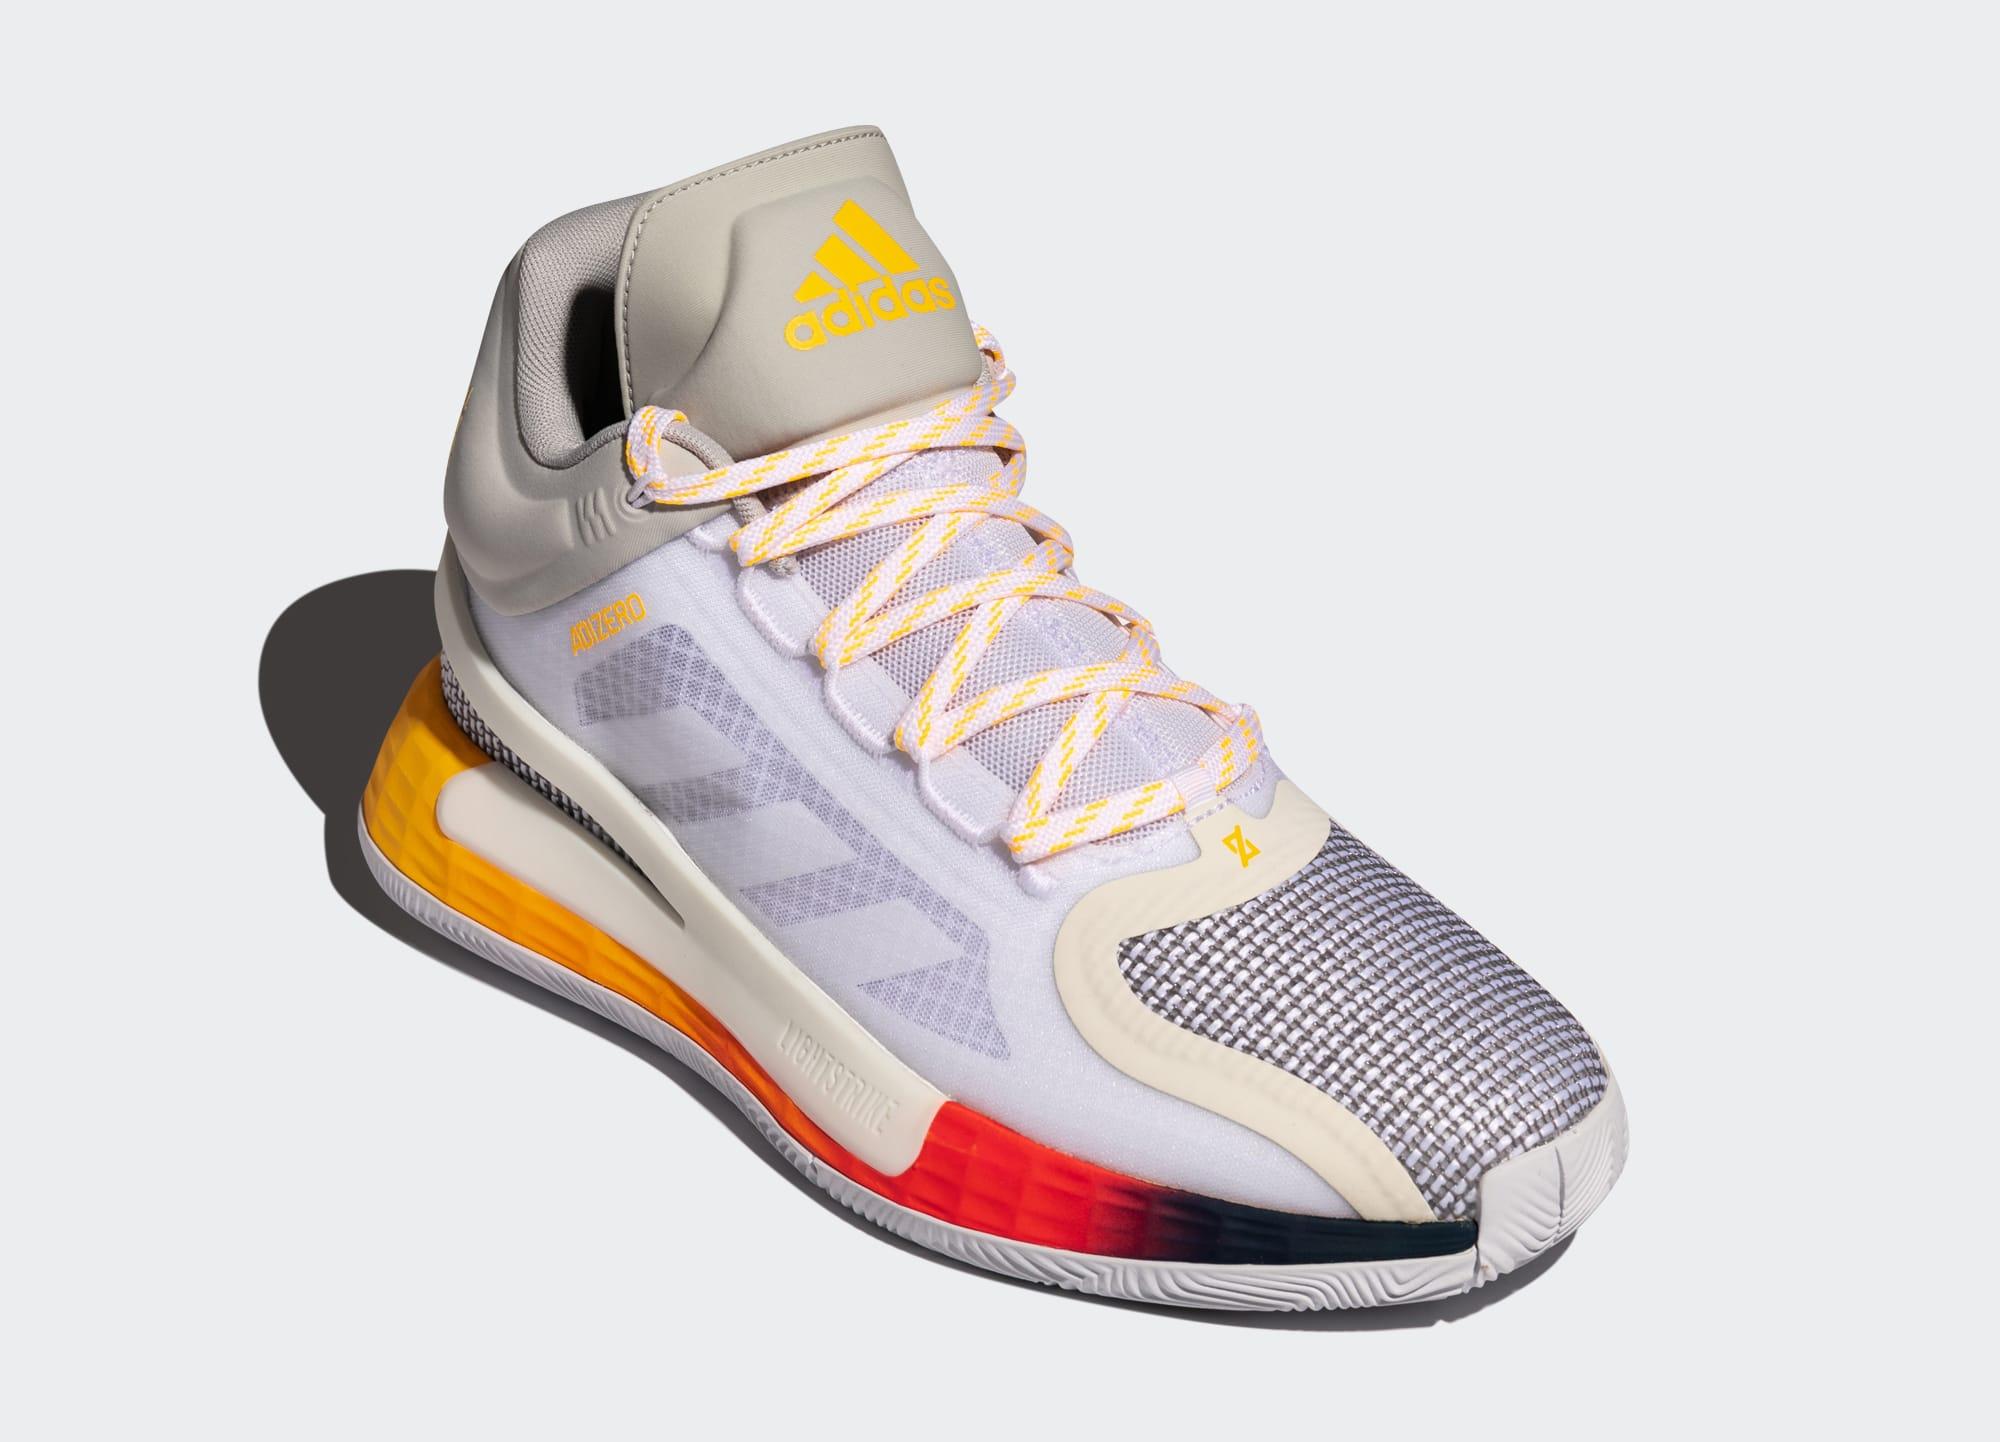 Adidas D Rose 11 'Ftwr White/Solar Gold/Tech Indigo' FW8508 Front